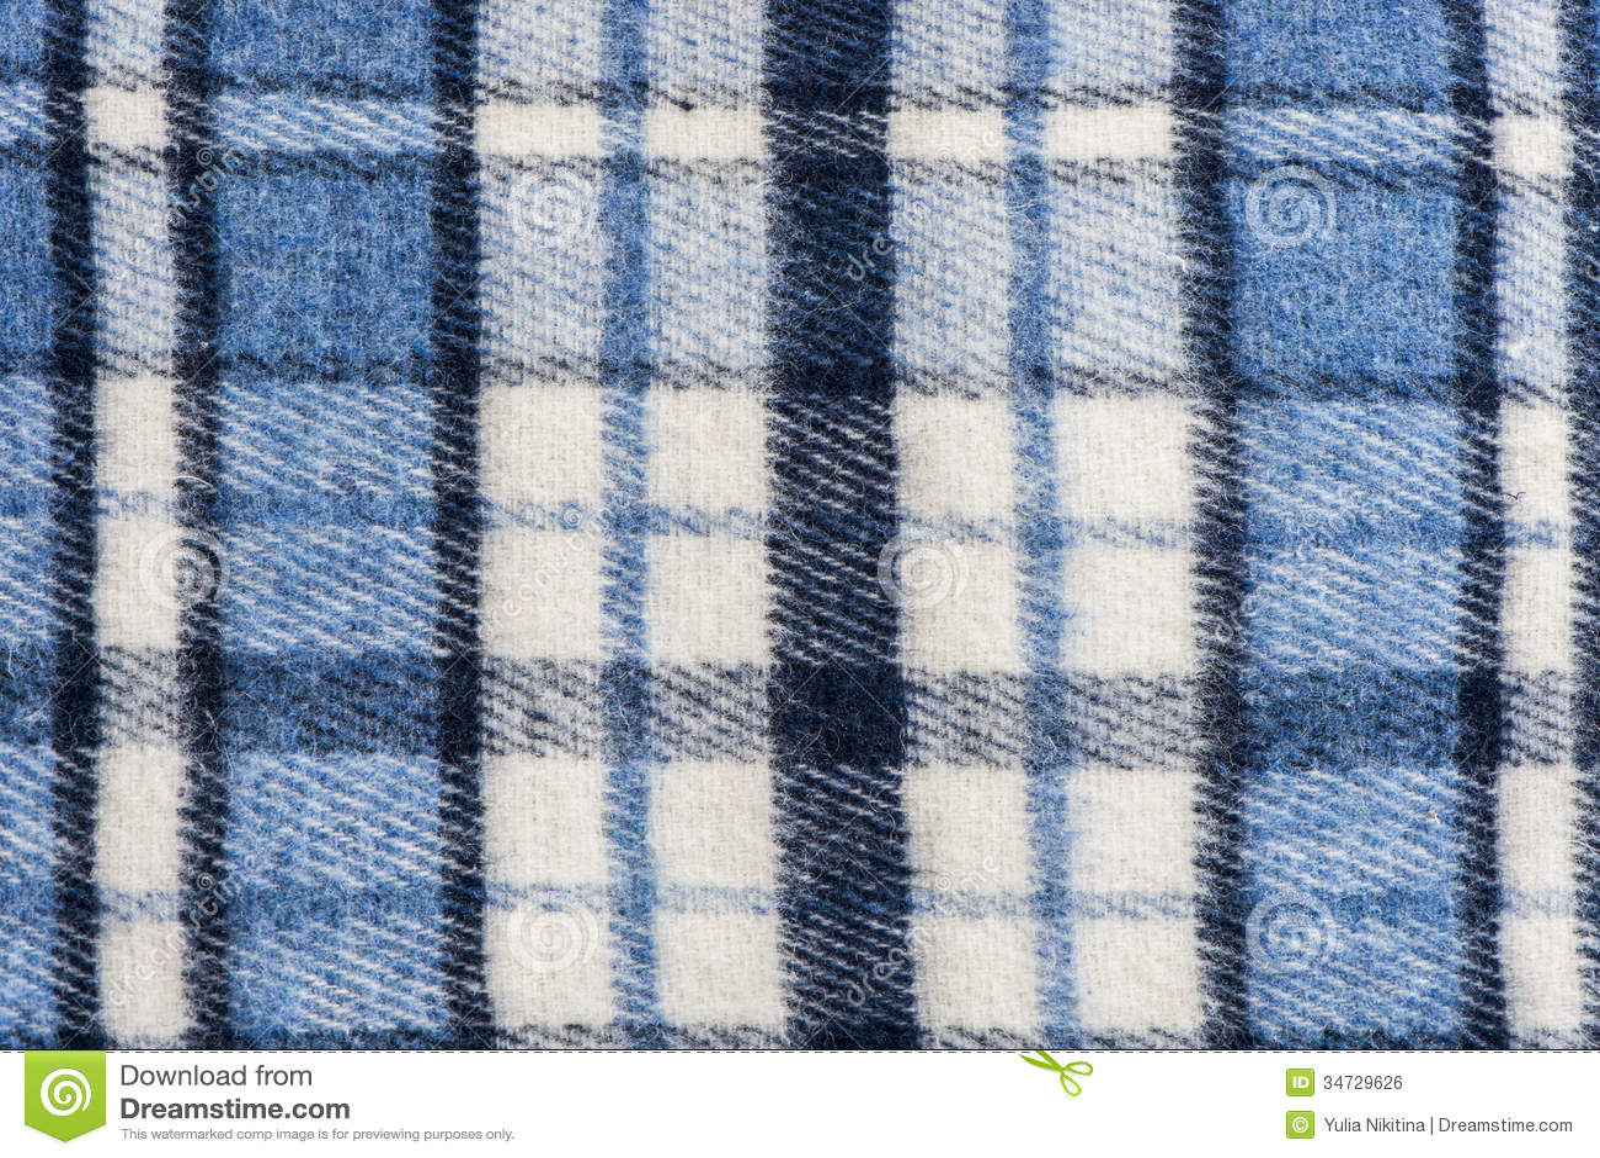 Black Textured Wallpaper Tartan Plaid Wool Fabric Stock Photo Image Of Kilt